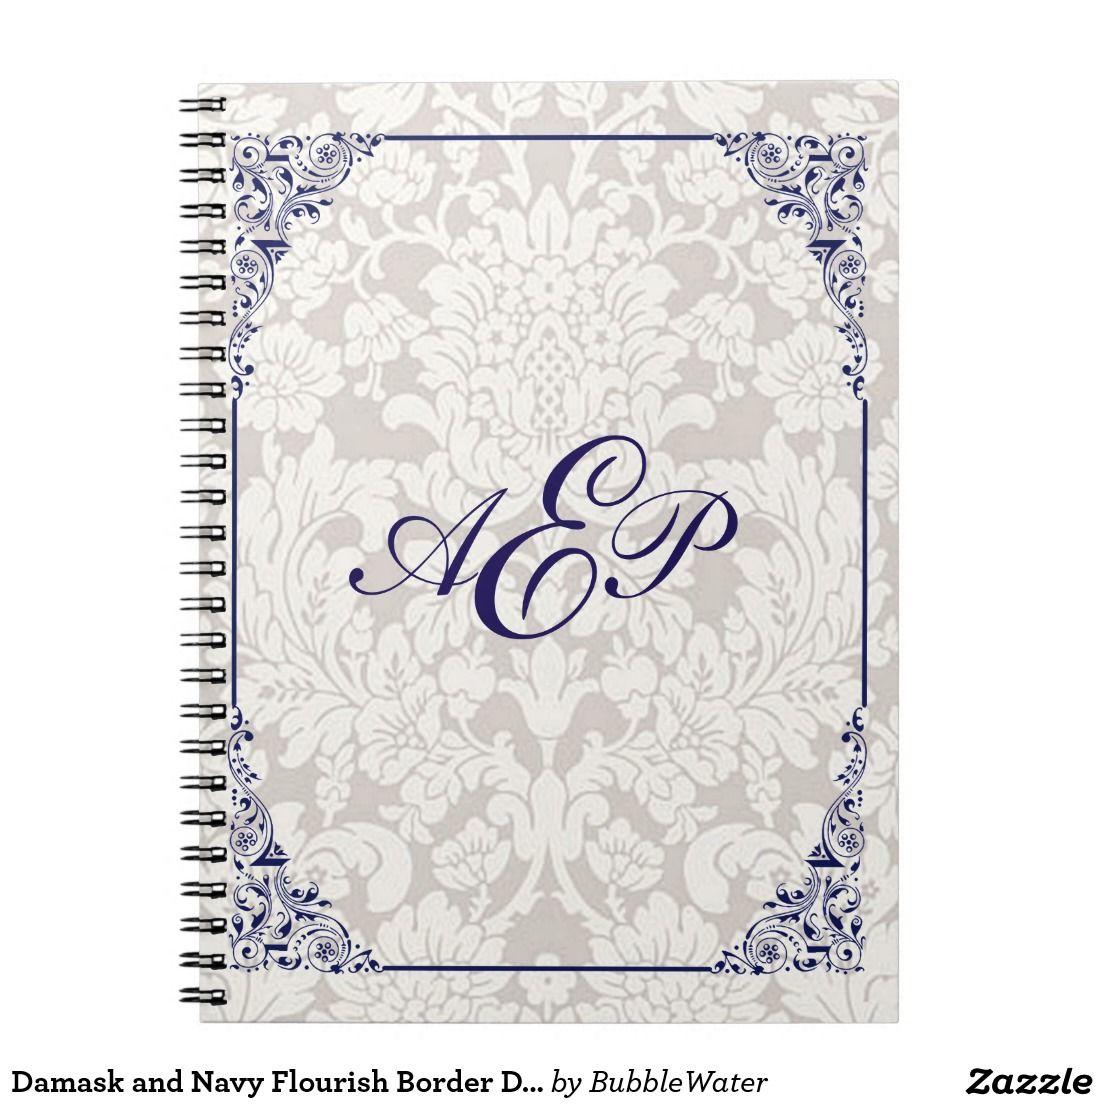 Damask And Navy Flourish Border Design Notebook Flourish Border Border Design Damask